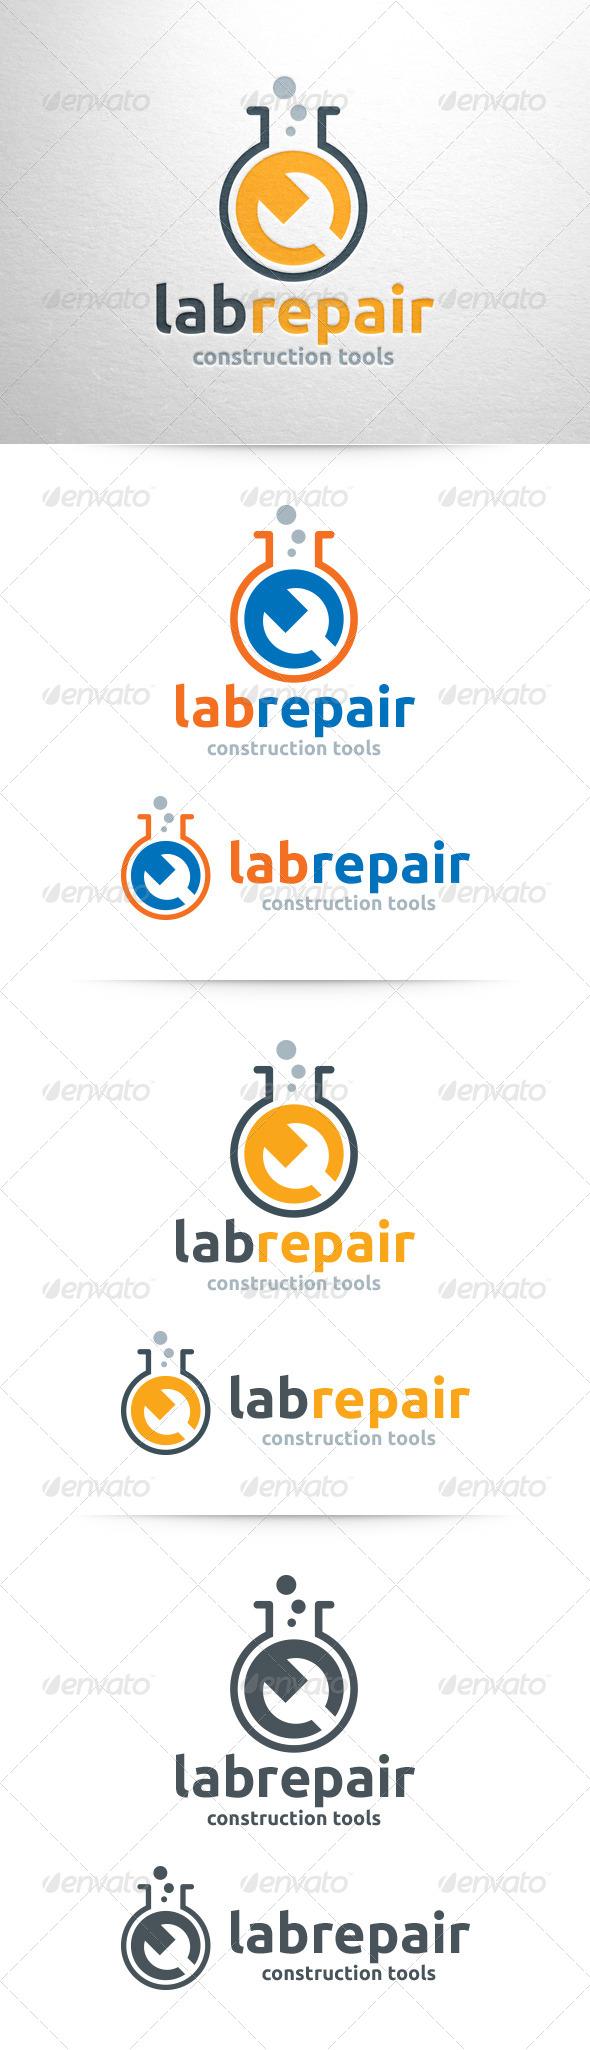 GraphicRiver Lab Repair Logo Template 6497630